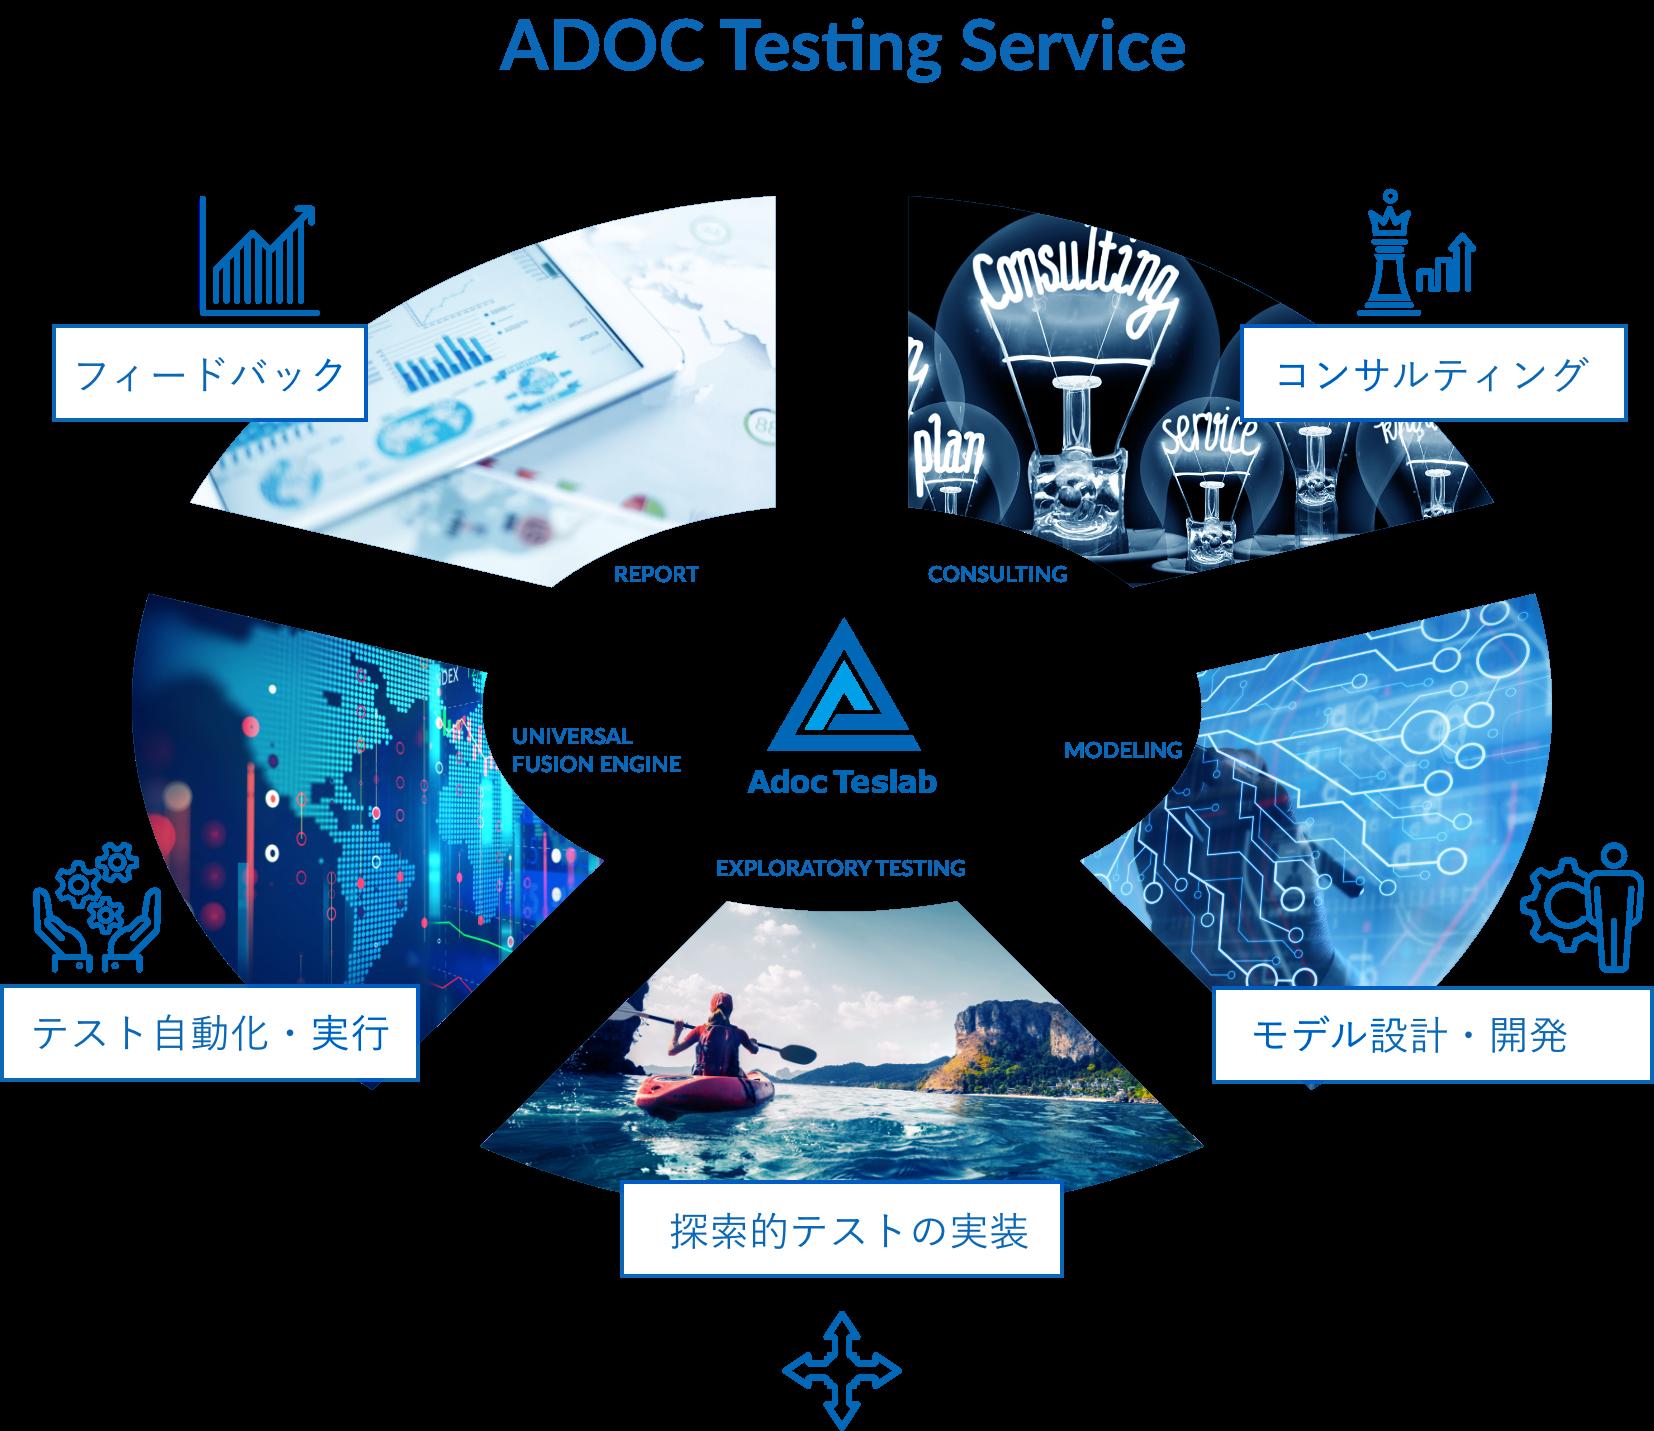 ADOC Testing Service (ATS) 概略図